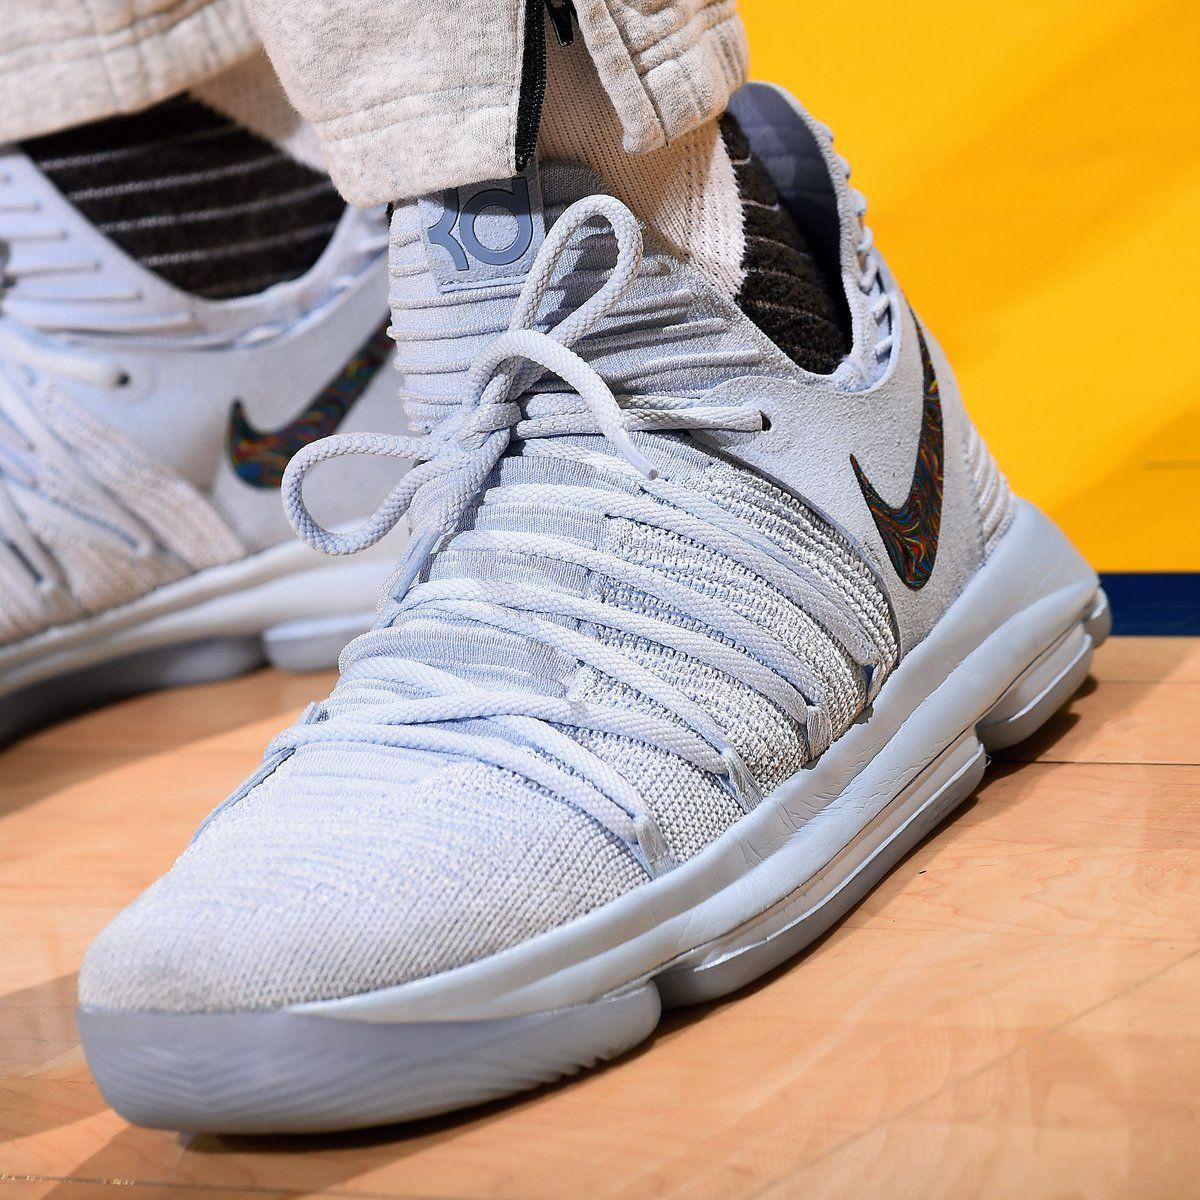 2017 Nike KD 10  Anniversary  Suede Faint Blue For Sale – Hoop Jordan a2686b37d